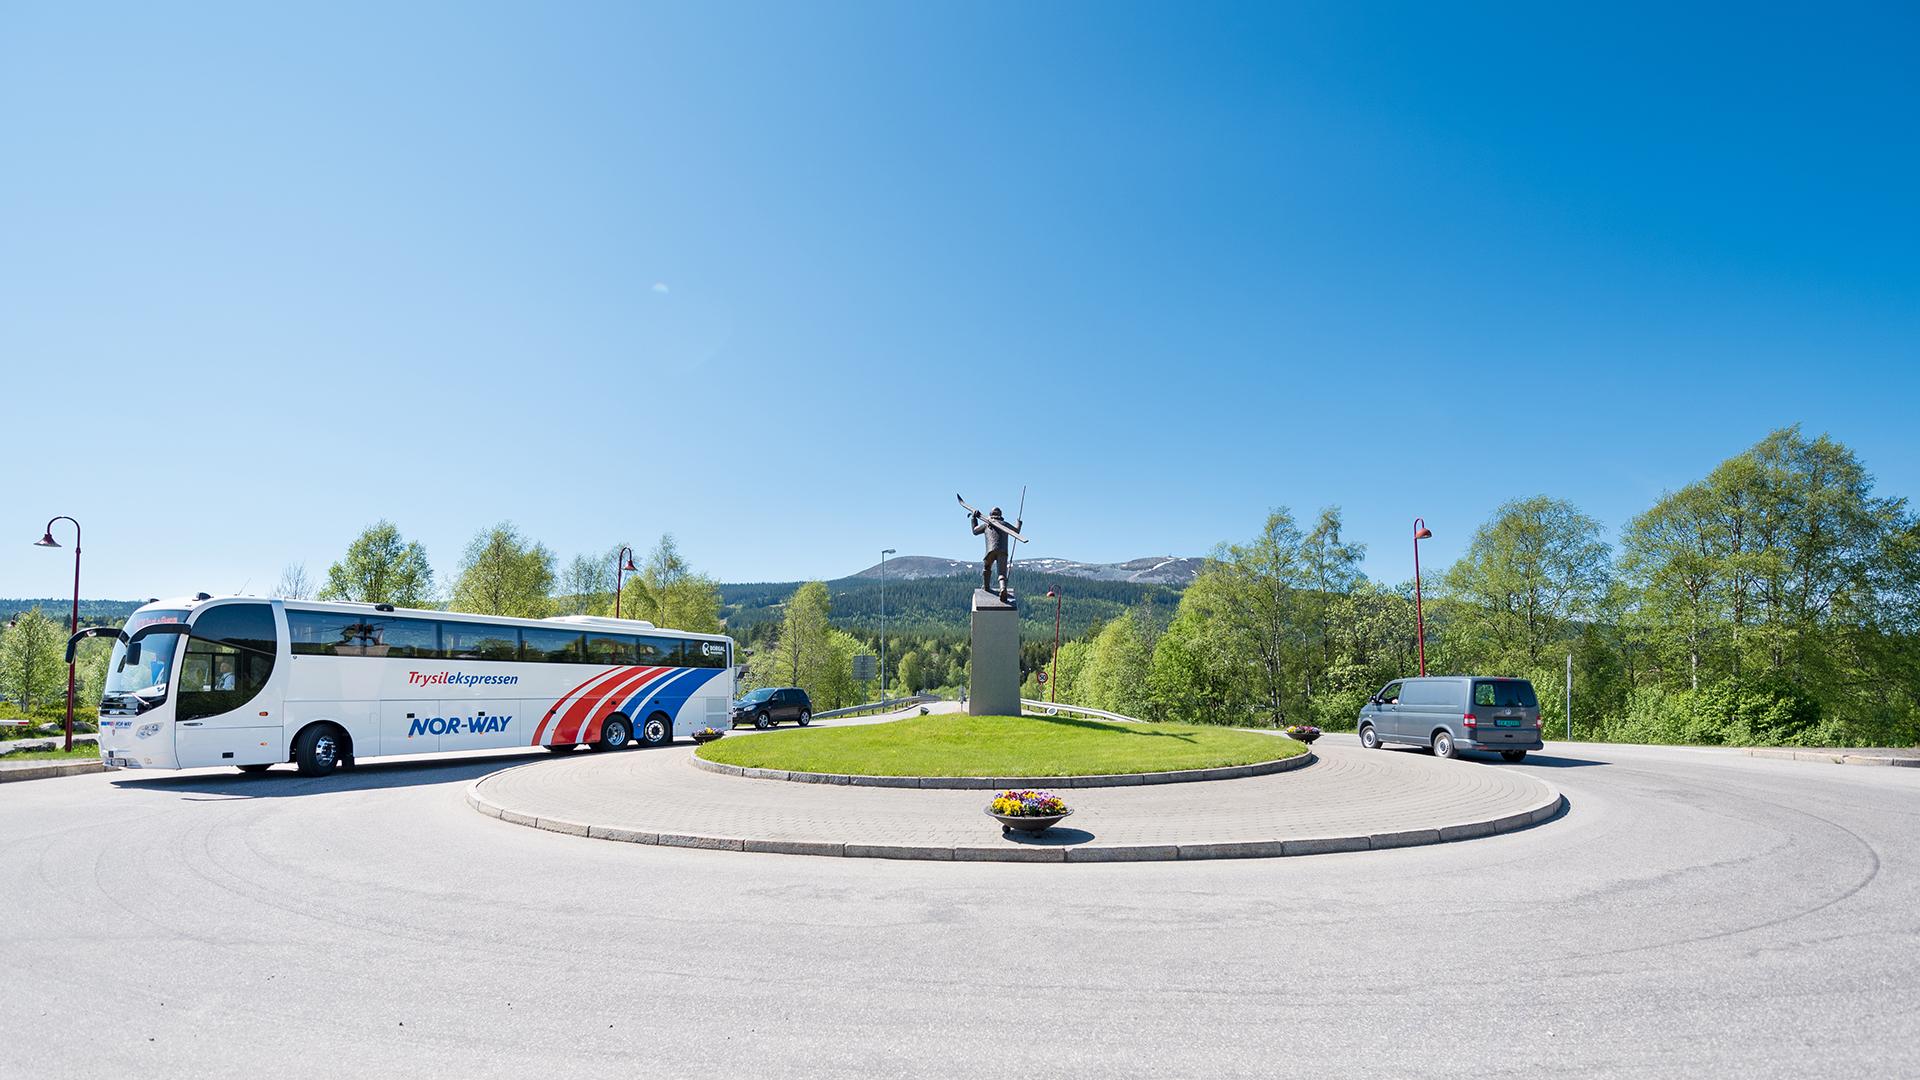 Bussruter Oslo Trysil